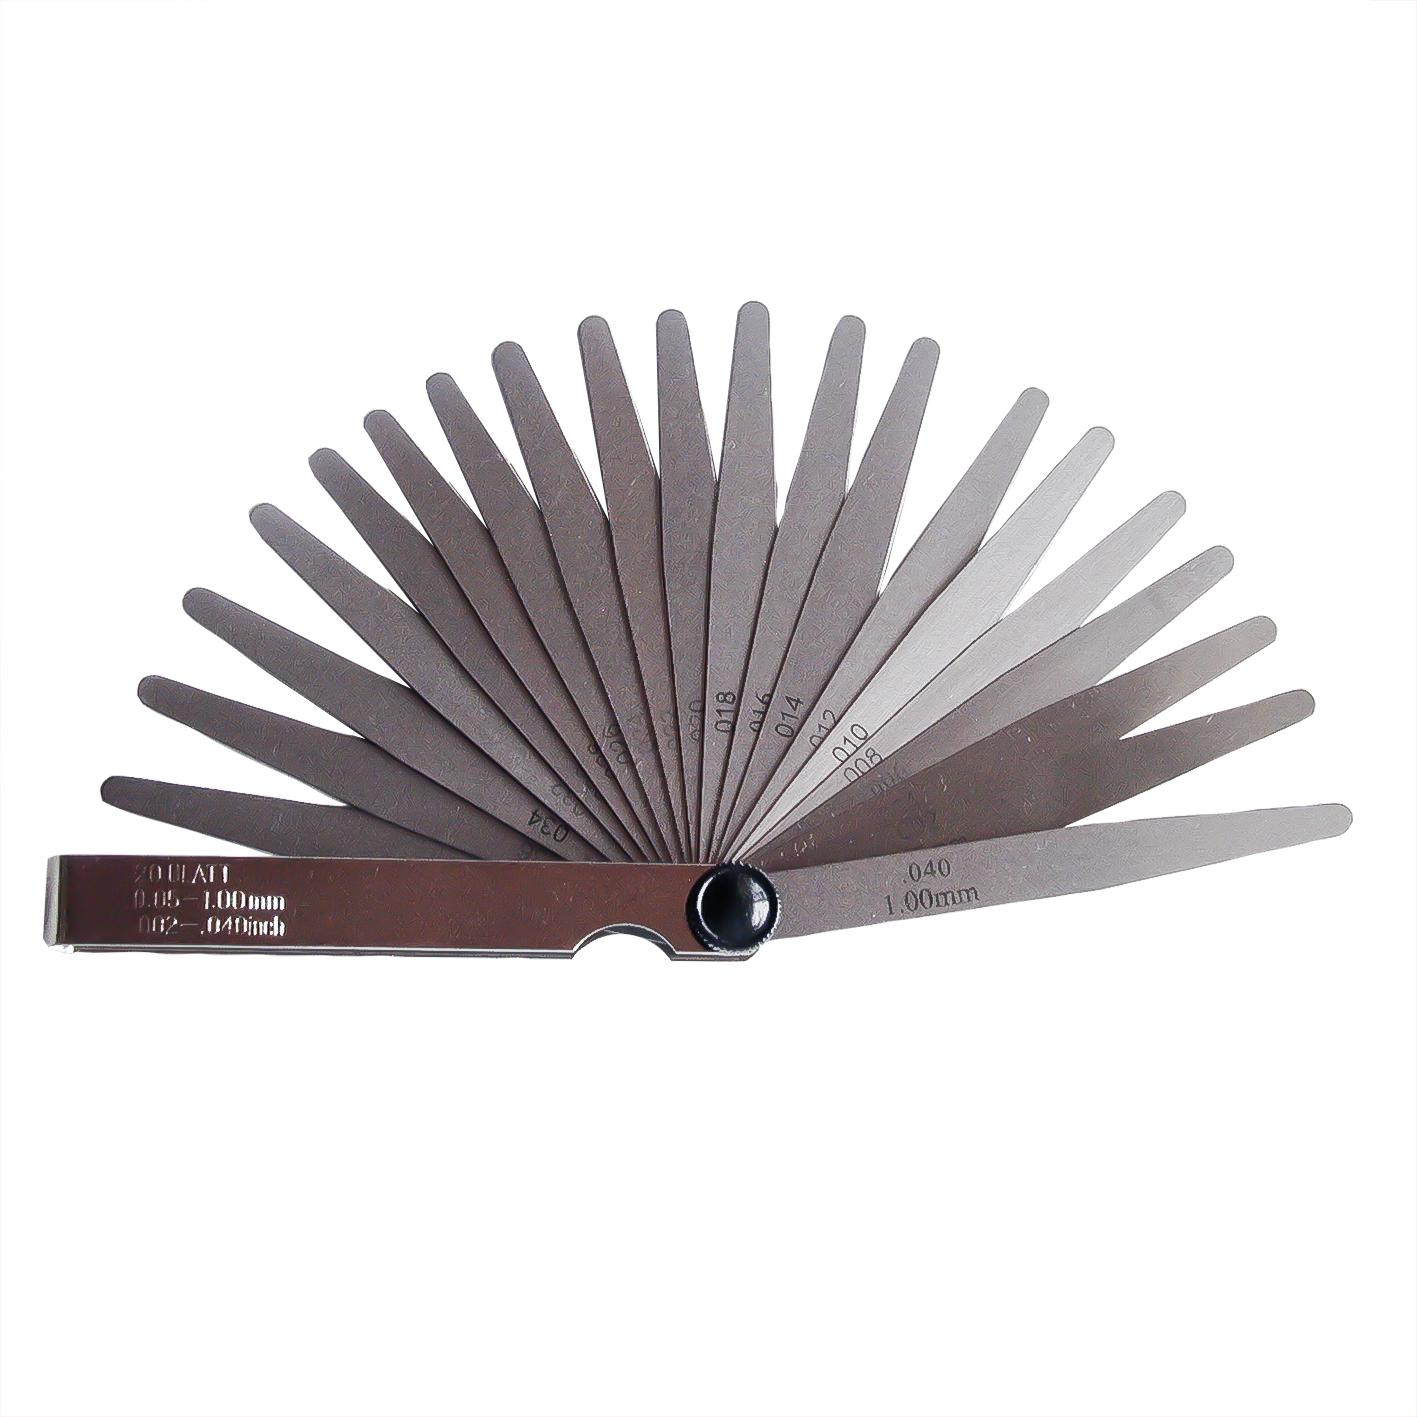 Feeler gauge with 20 blades